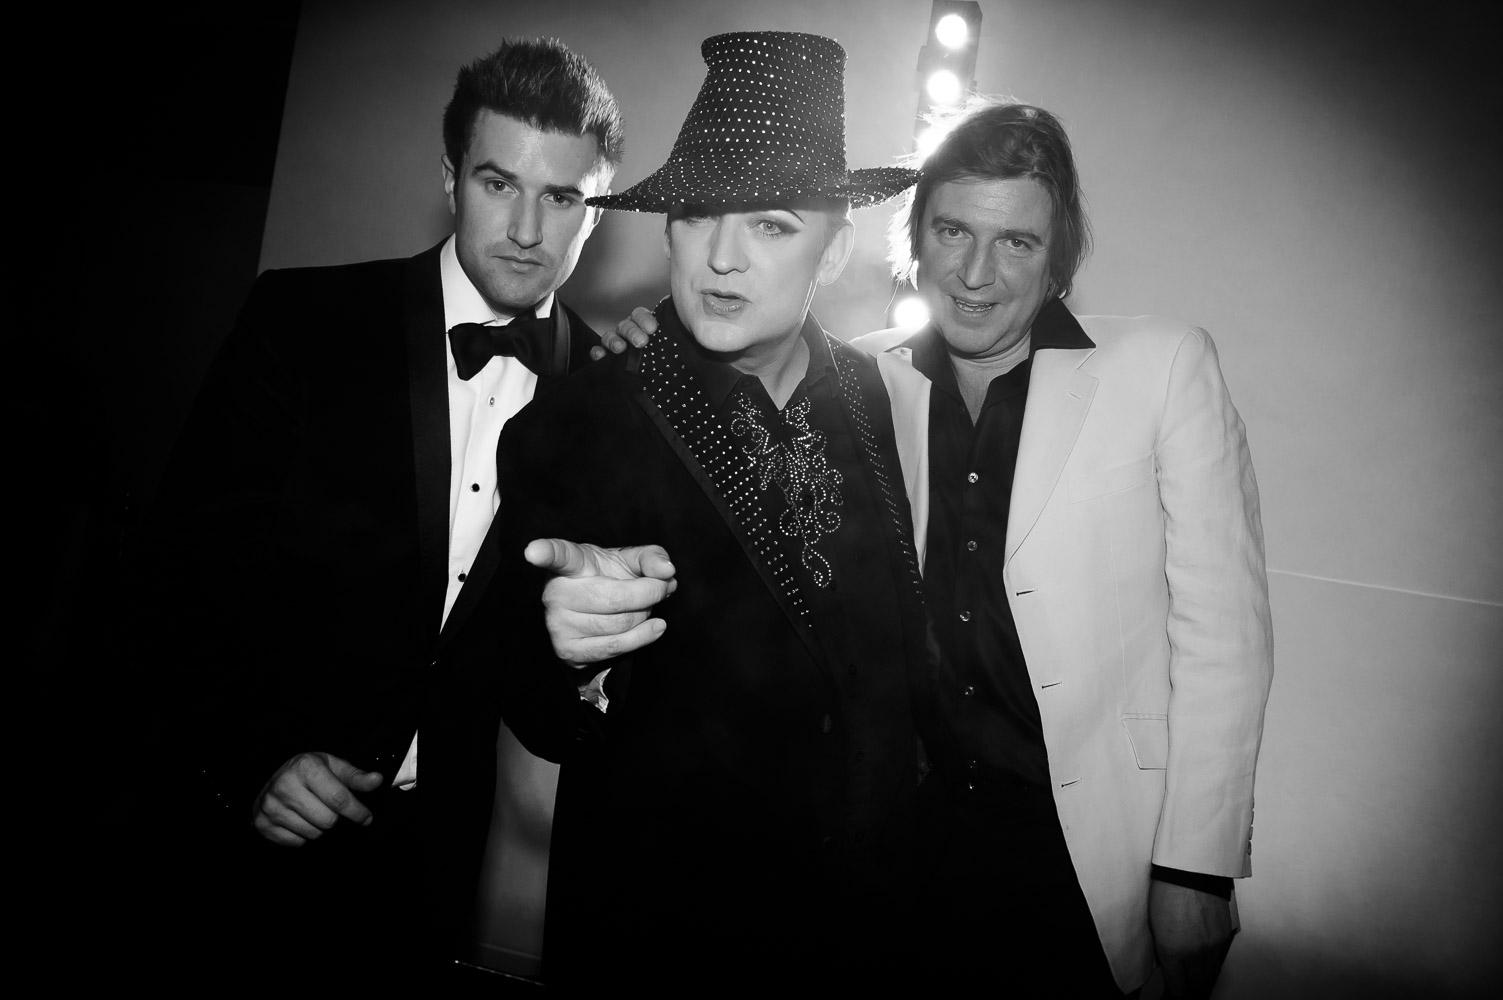 London Club & Bar Awards Event 2012